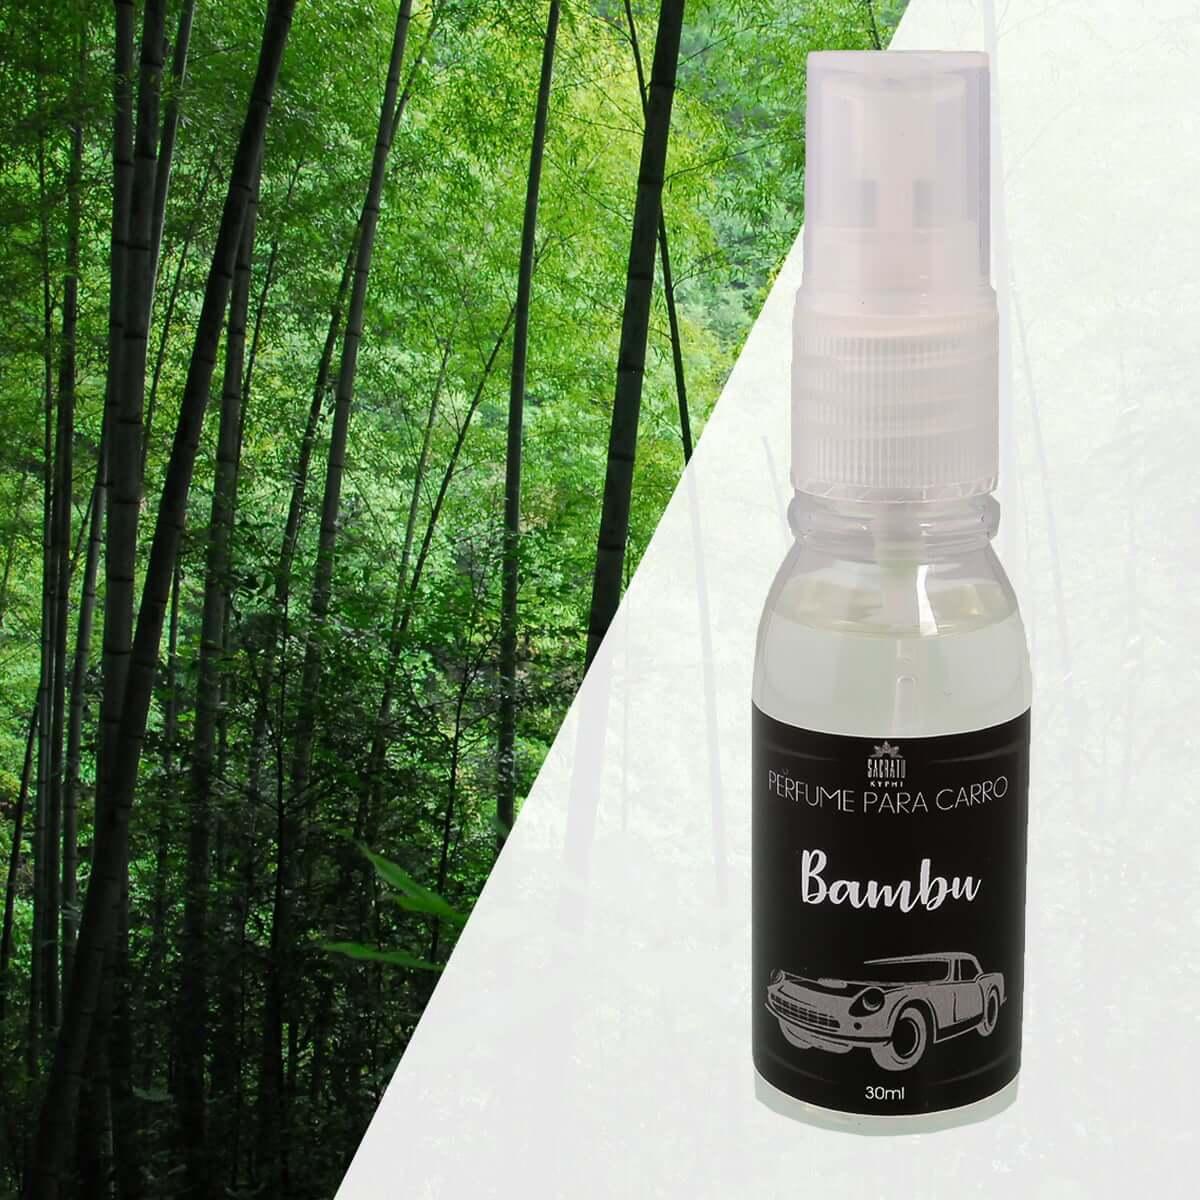 Perfume para Carro Bambu 30ml